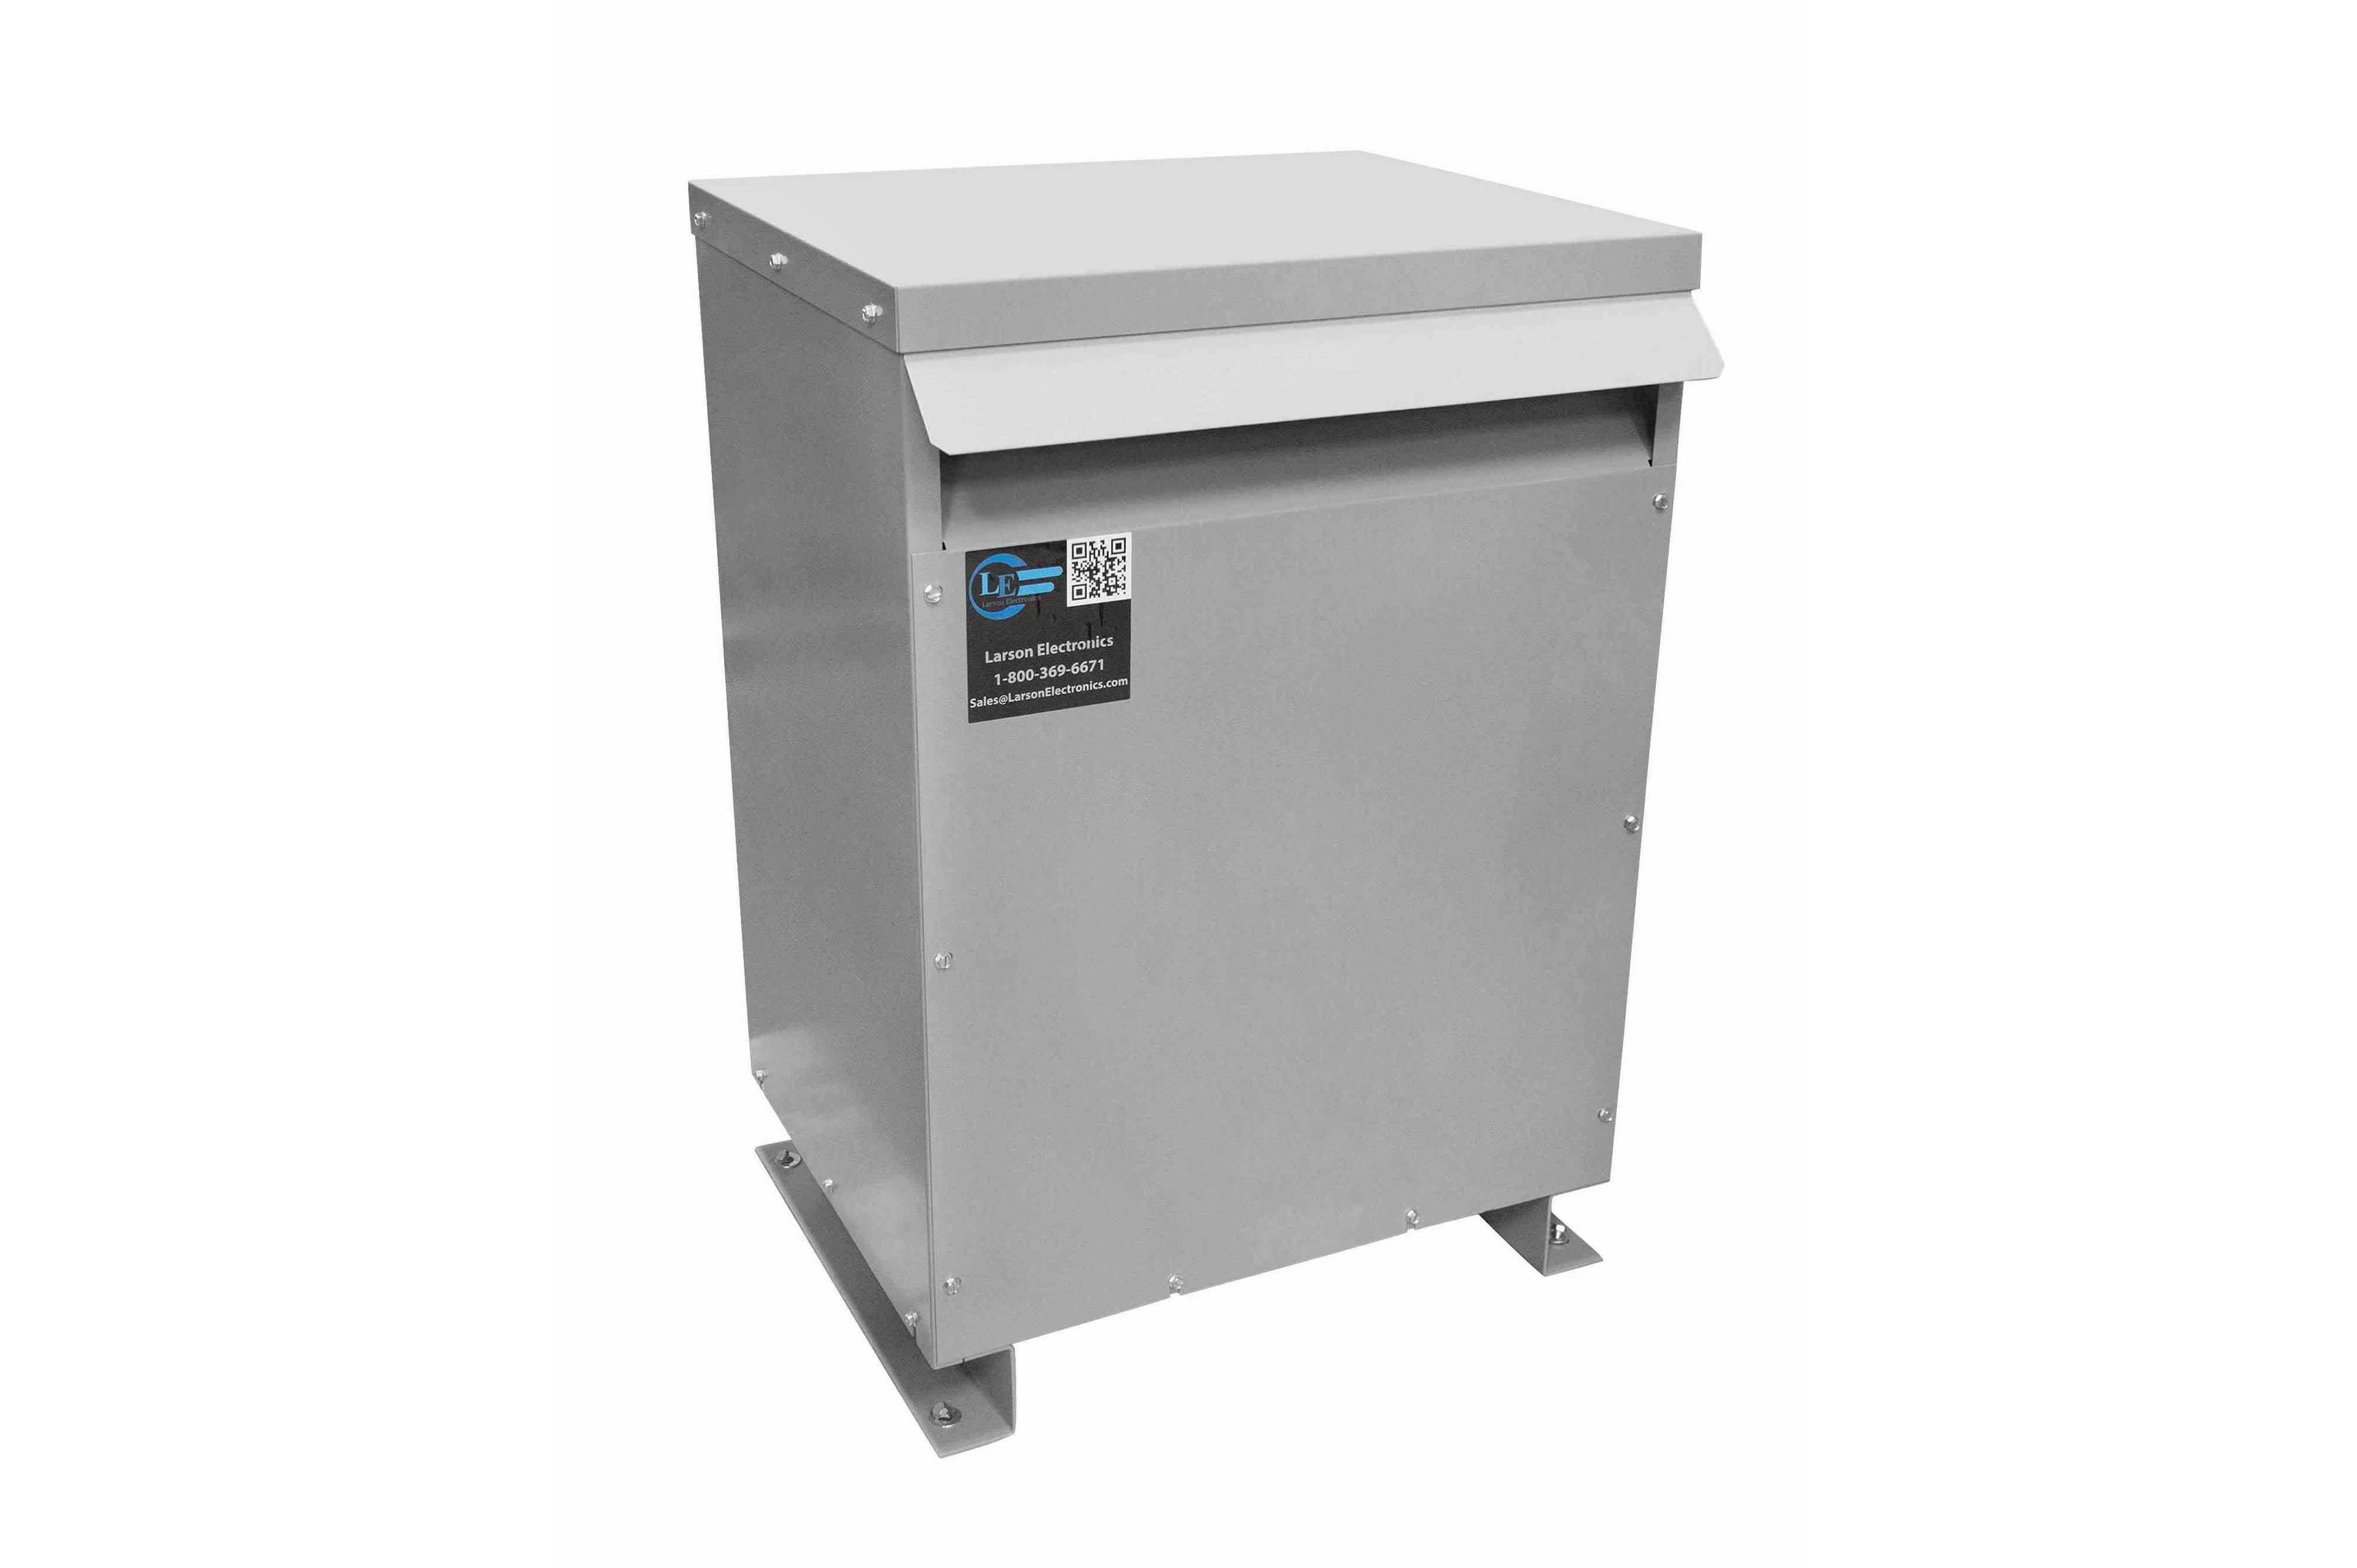 22.5 kVA 3PH Isolation Transformer, 460V Wye Primary, 600V Delta Secondary, N3R, Ventilated, 60 Hz